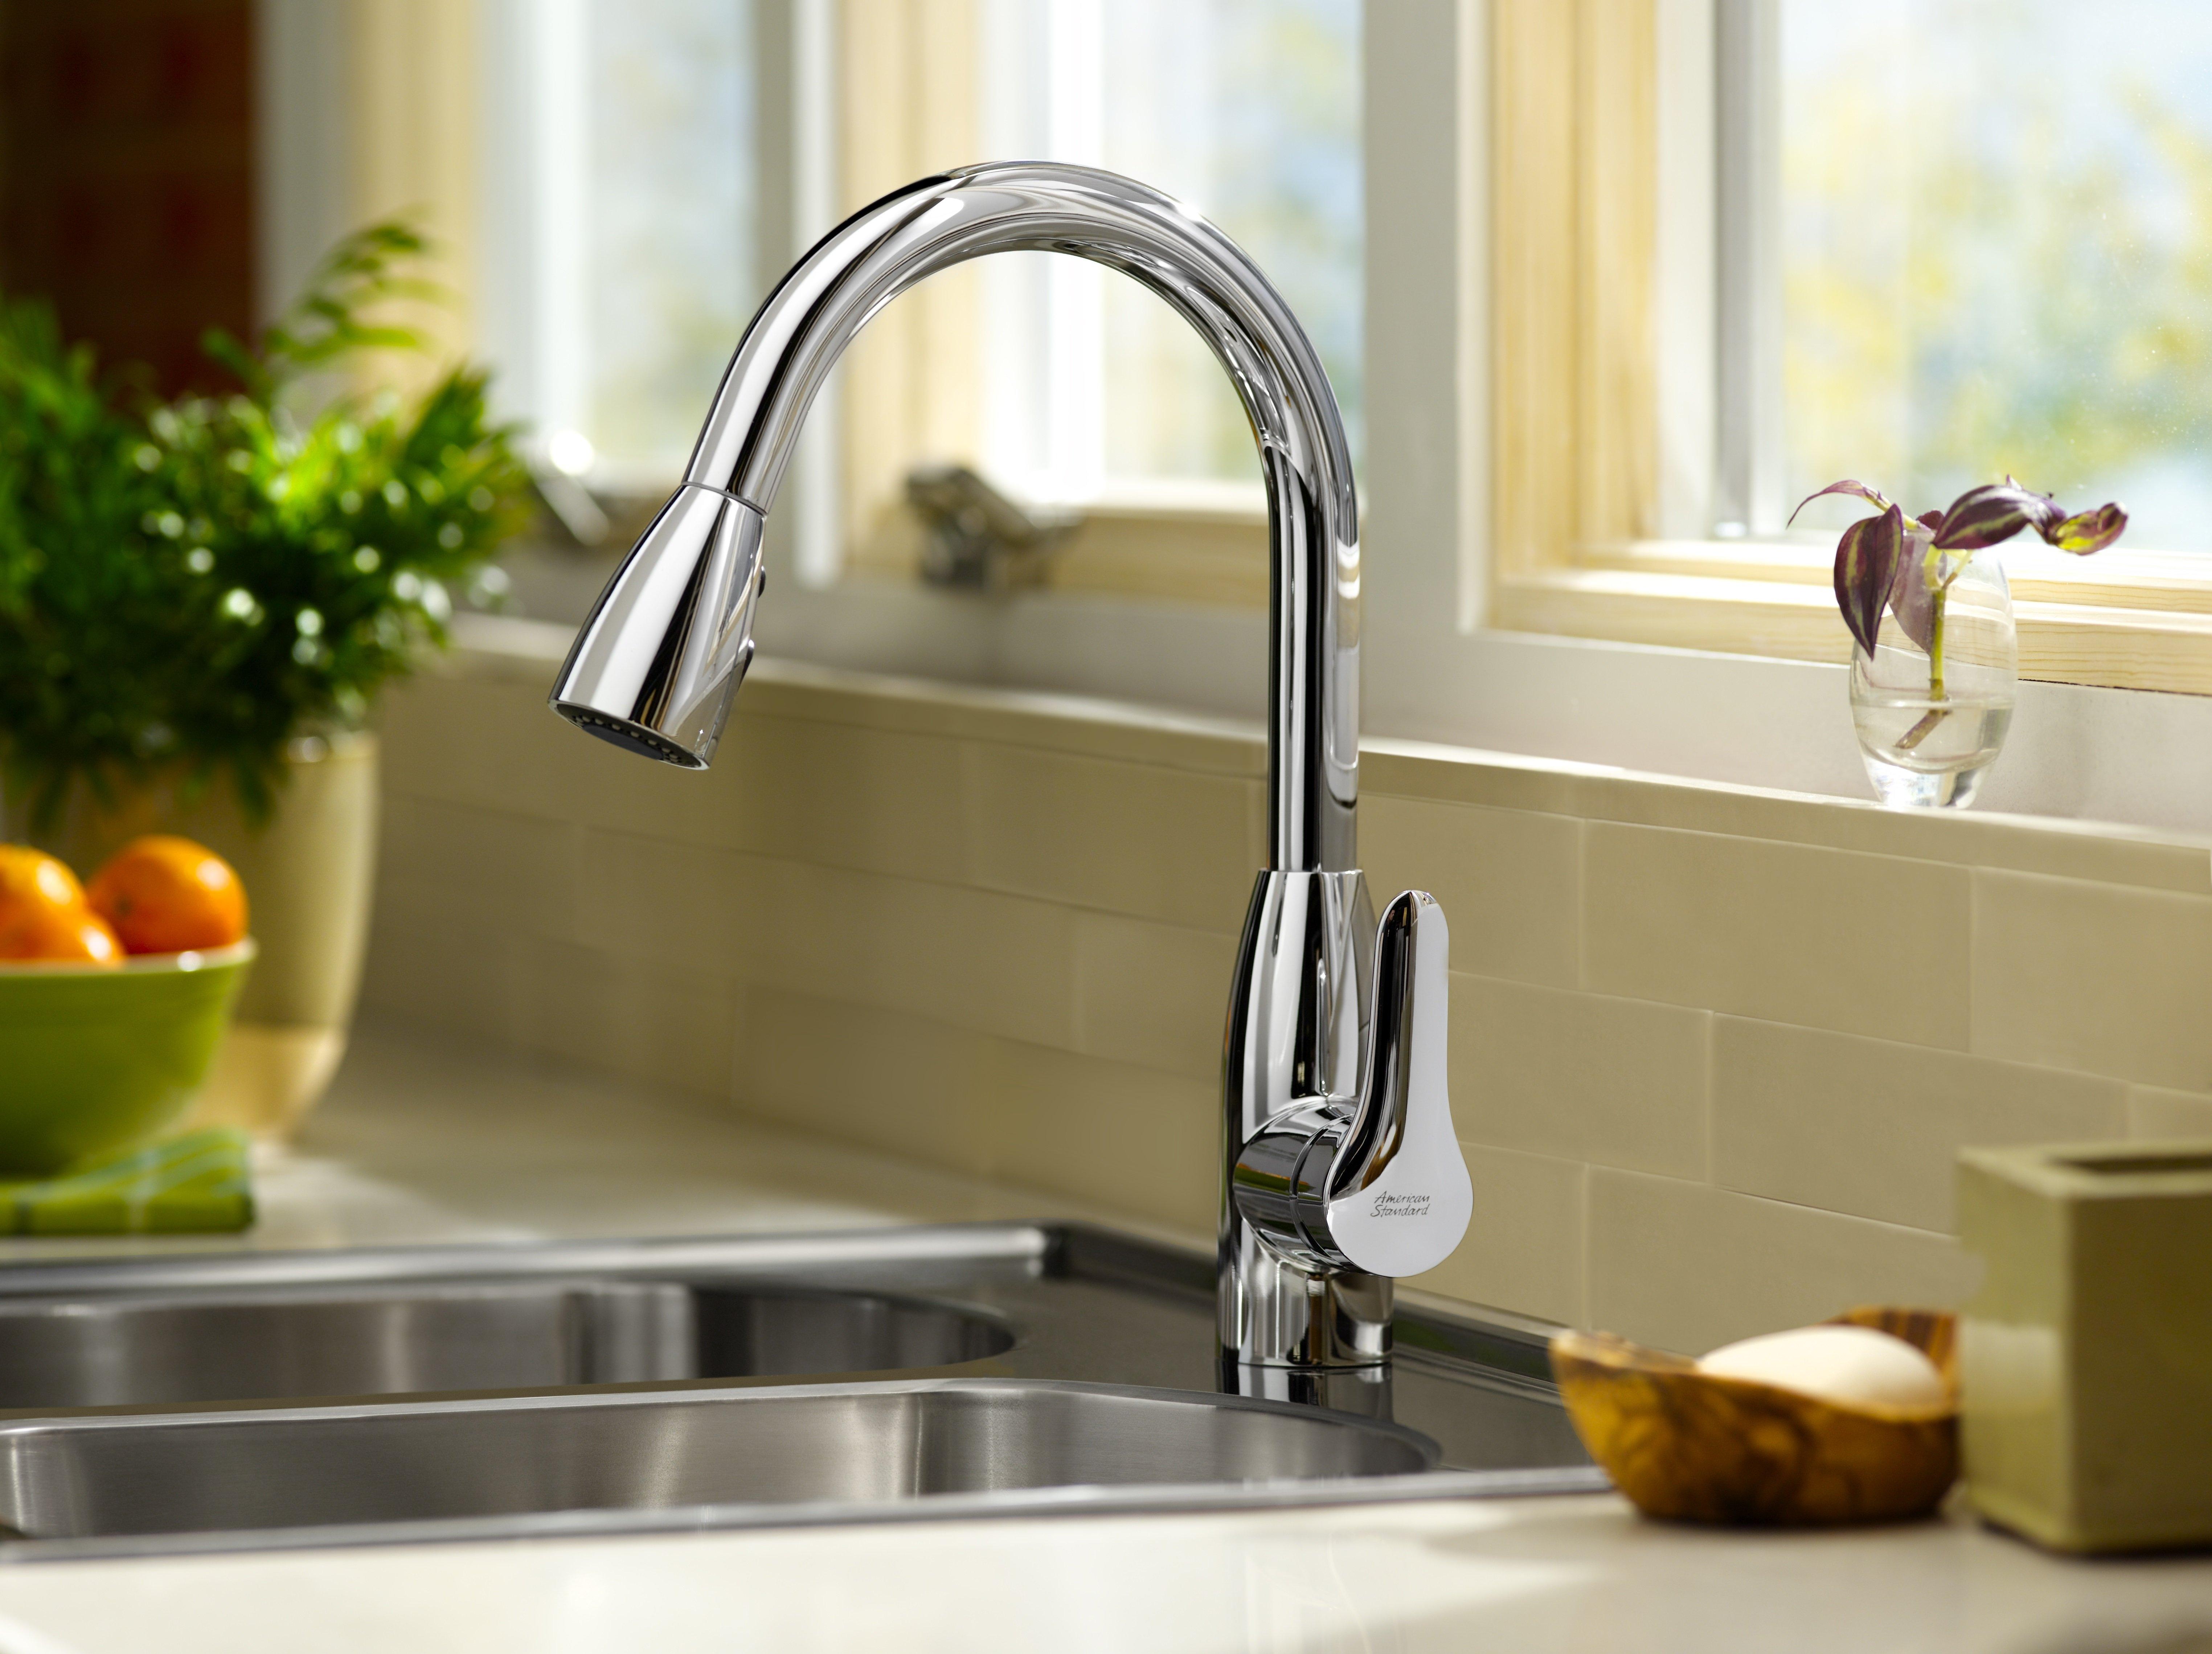 Ideas, custom kitchen sink faucets custom kitchen sink faucets kitchen faucet brilliant ideas traditional faucets g ambercombe 6096 x 4558  .